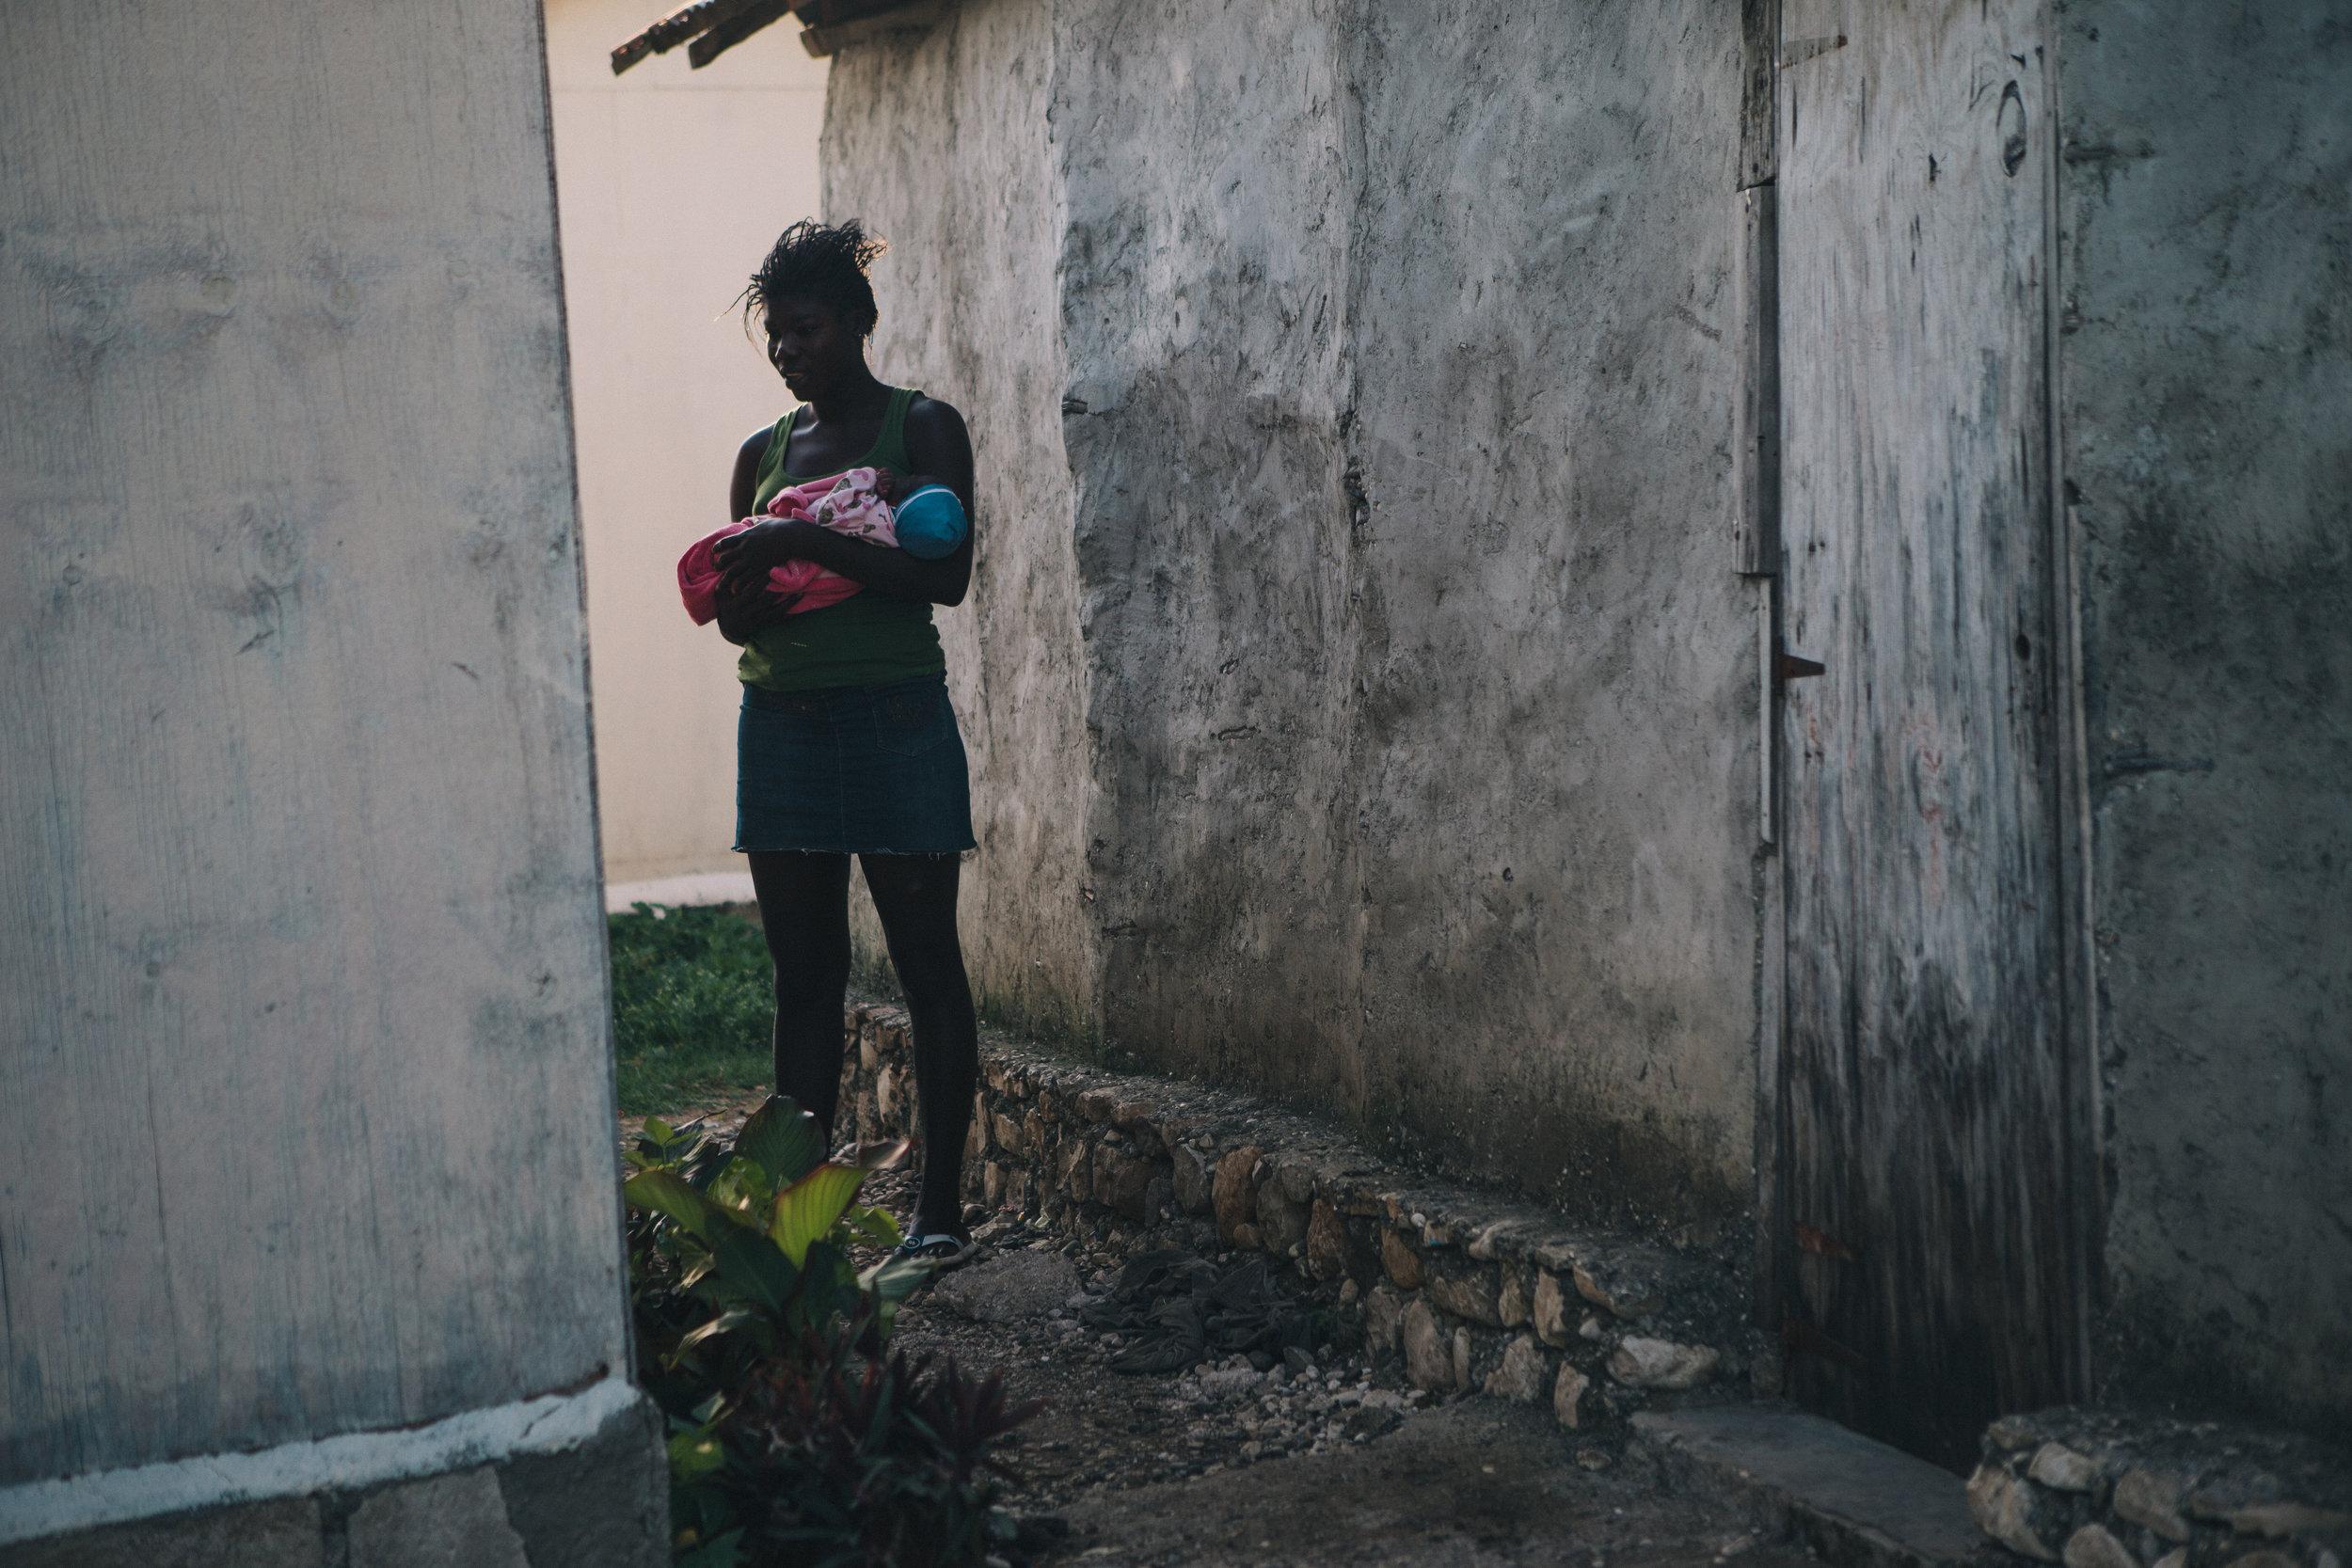 Haiti_Street_Scenes_015.jpg